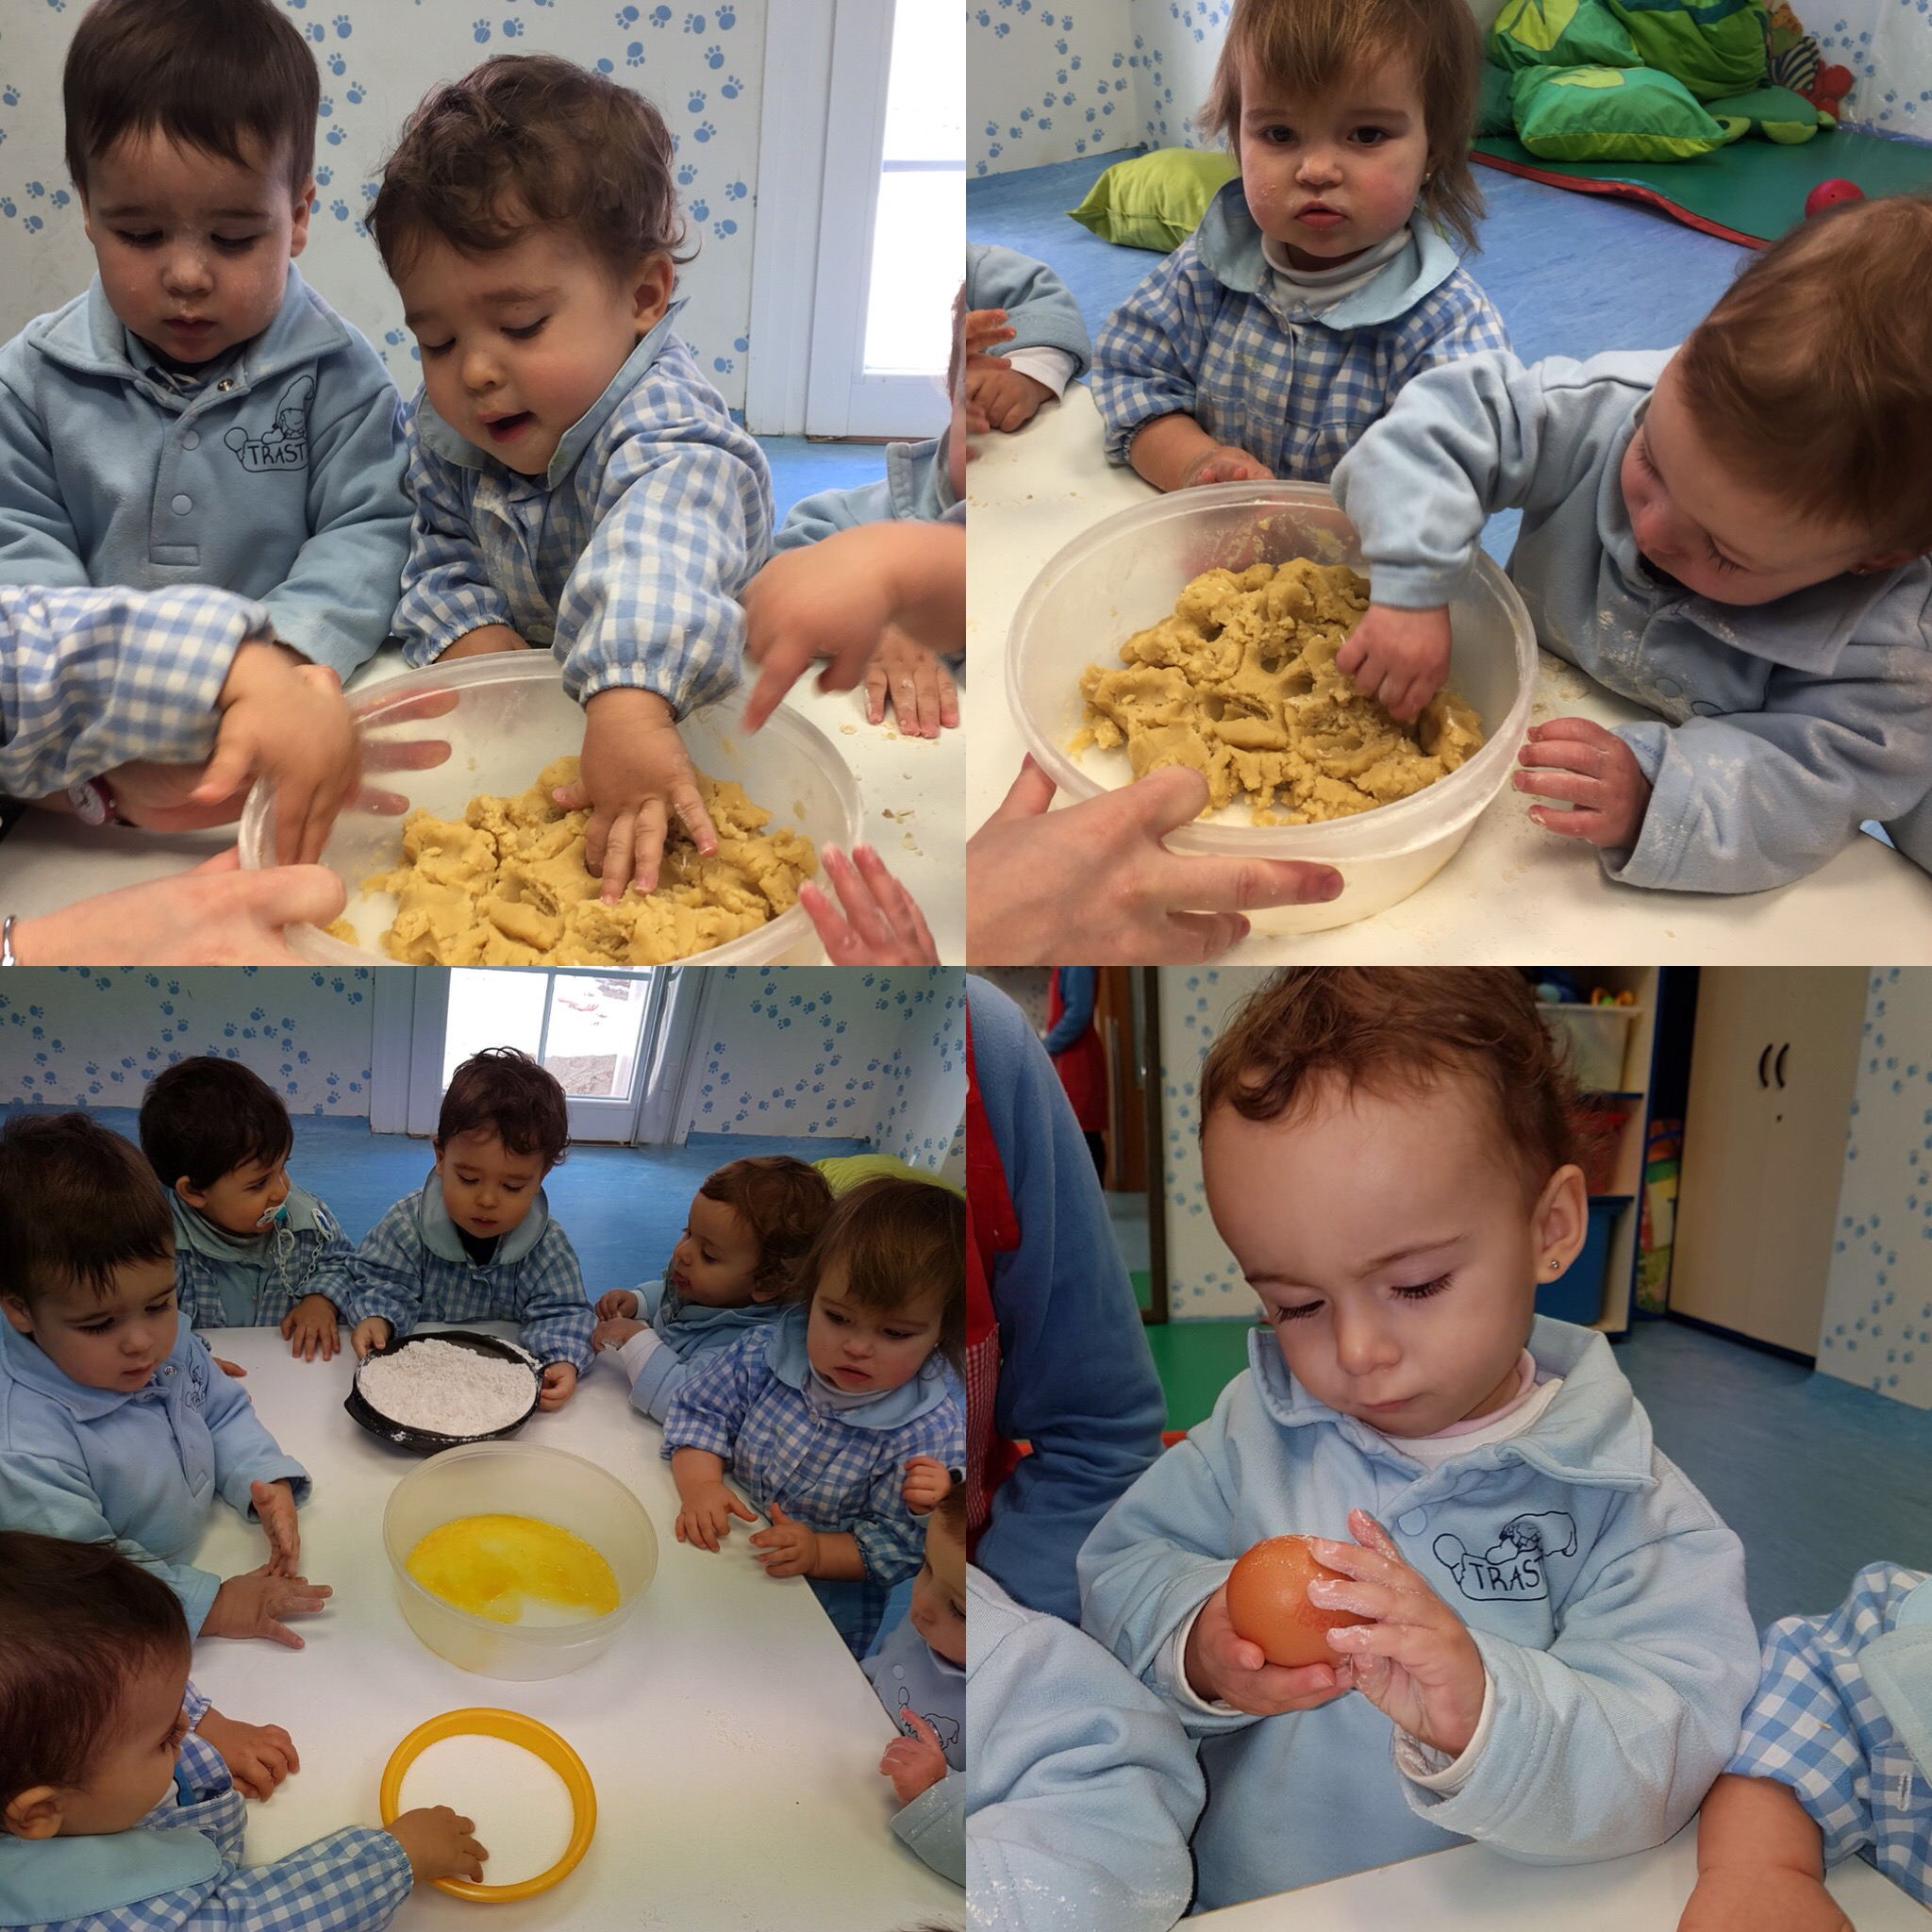 Escuela infantil para aprendizaje experiencial